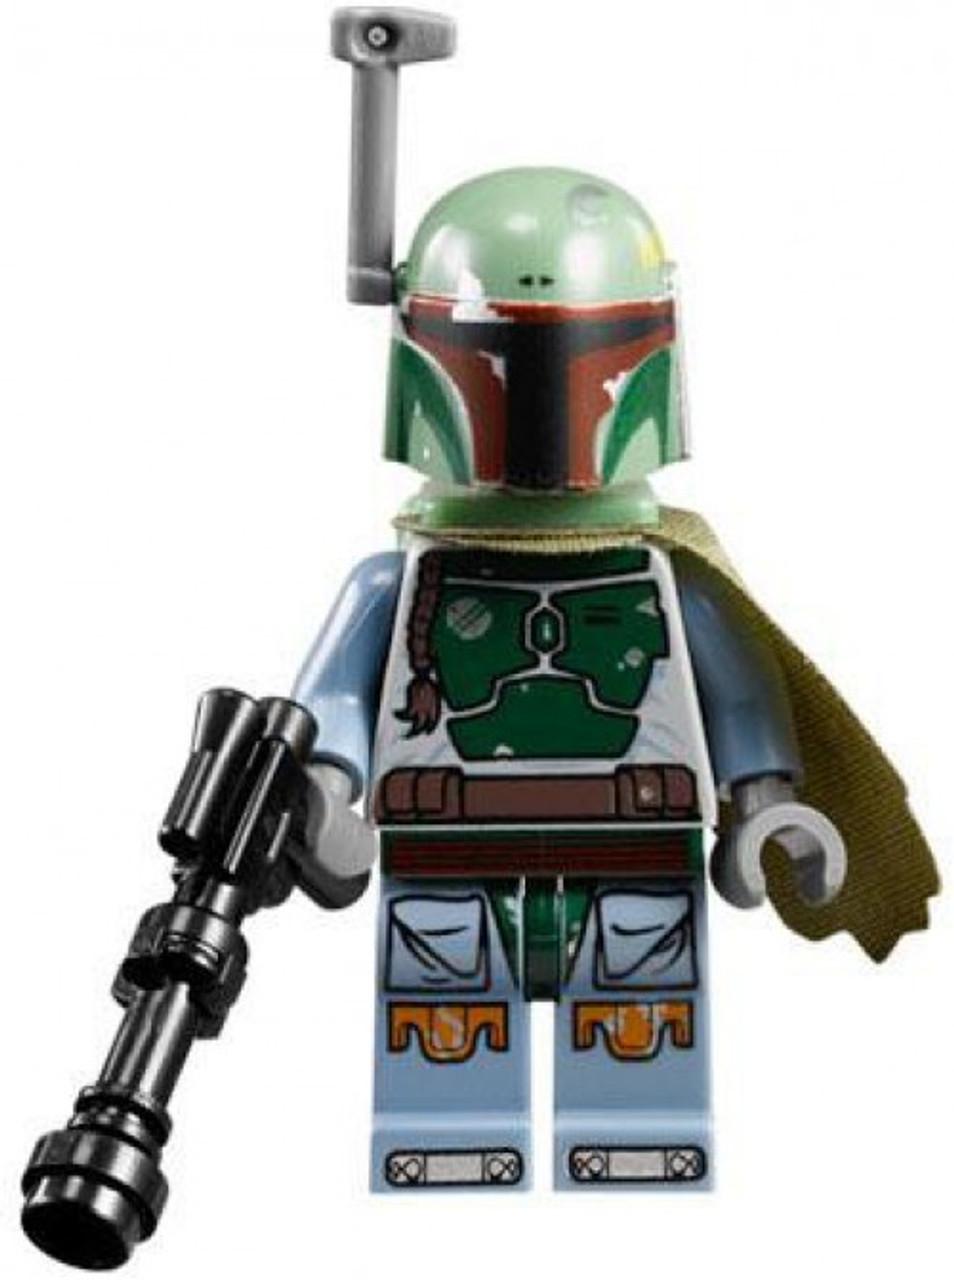 LEGO Star Wars Loose Boba Fett Minifigure [Blue Loose]